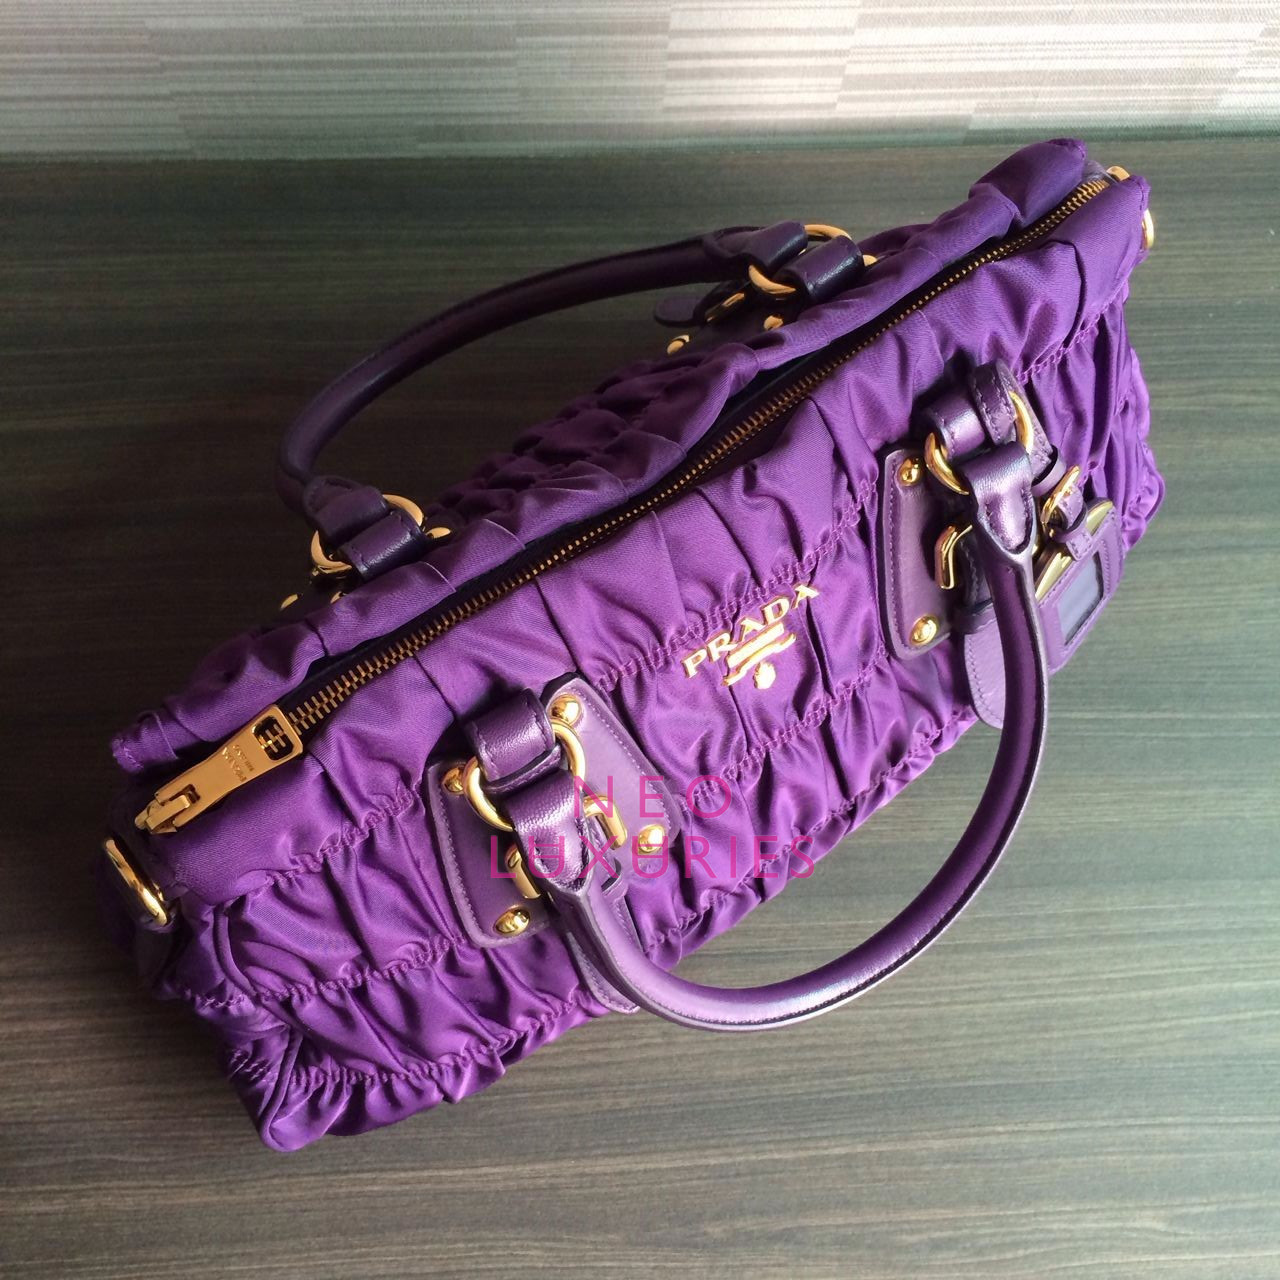 prada lime green purse - Neo LUXuries: SOLD: PRADA Tessuto/Nappa Gaufre' Small Top Handle ...